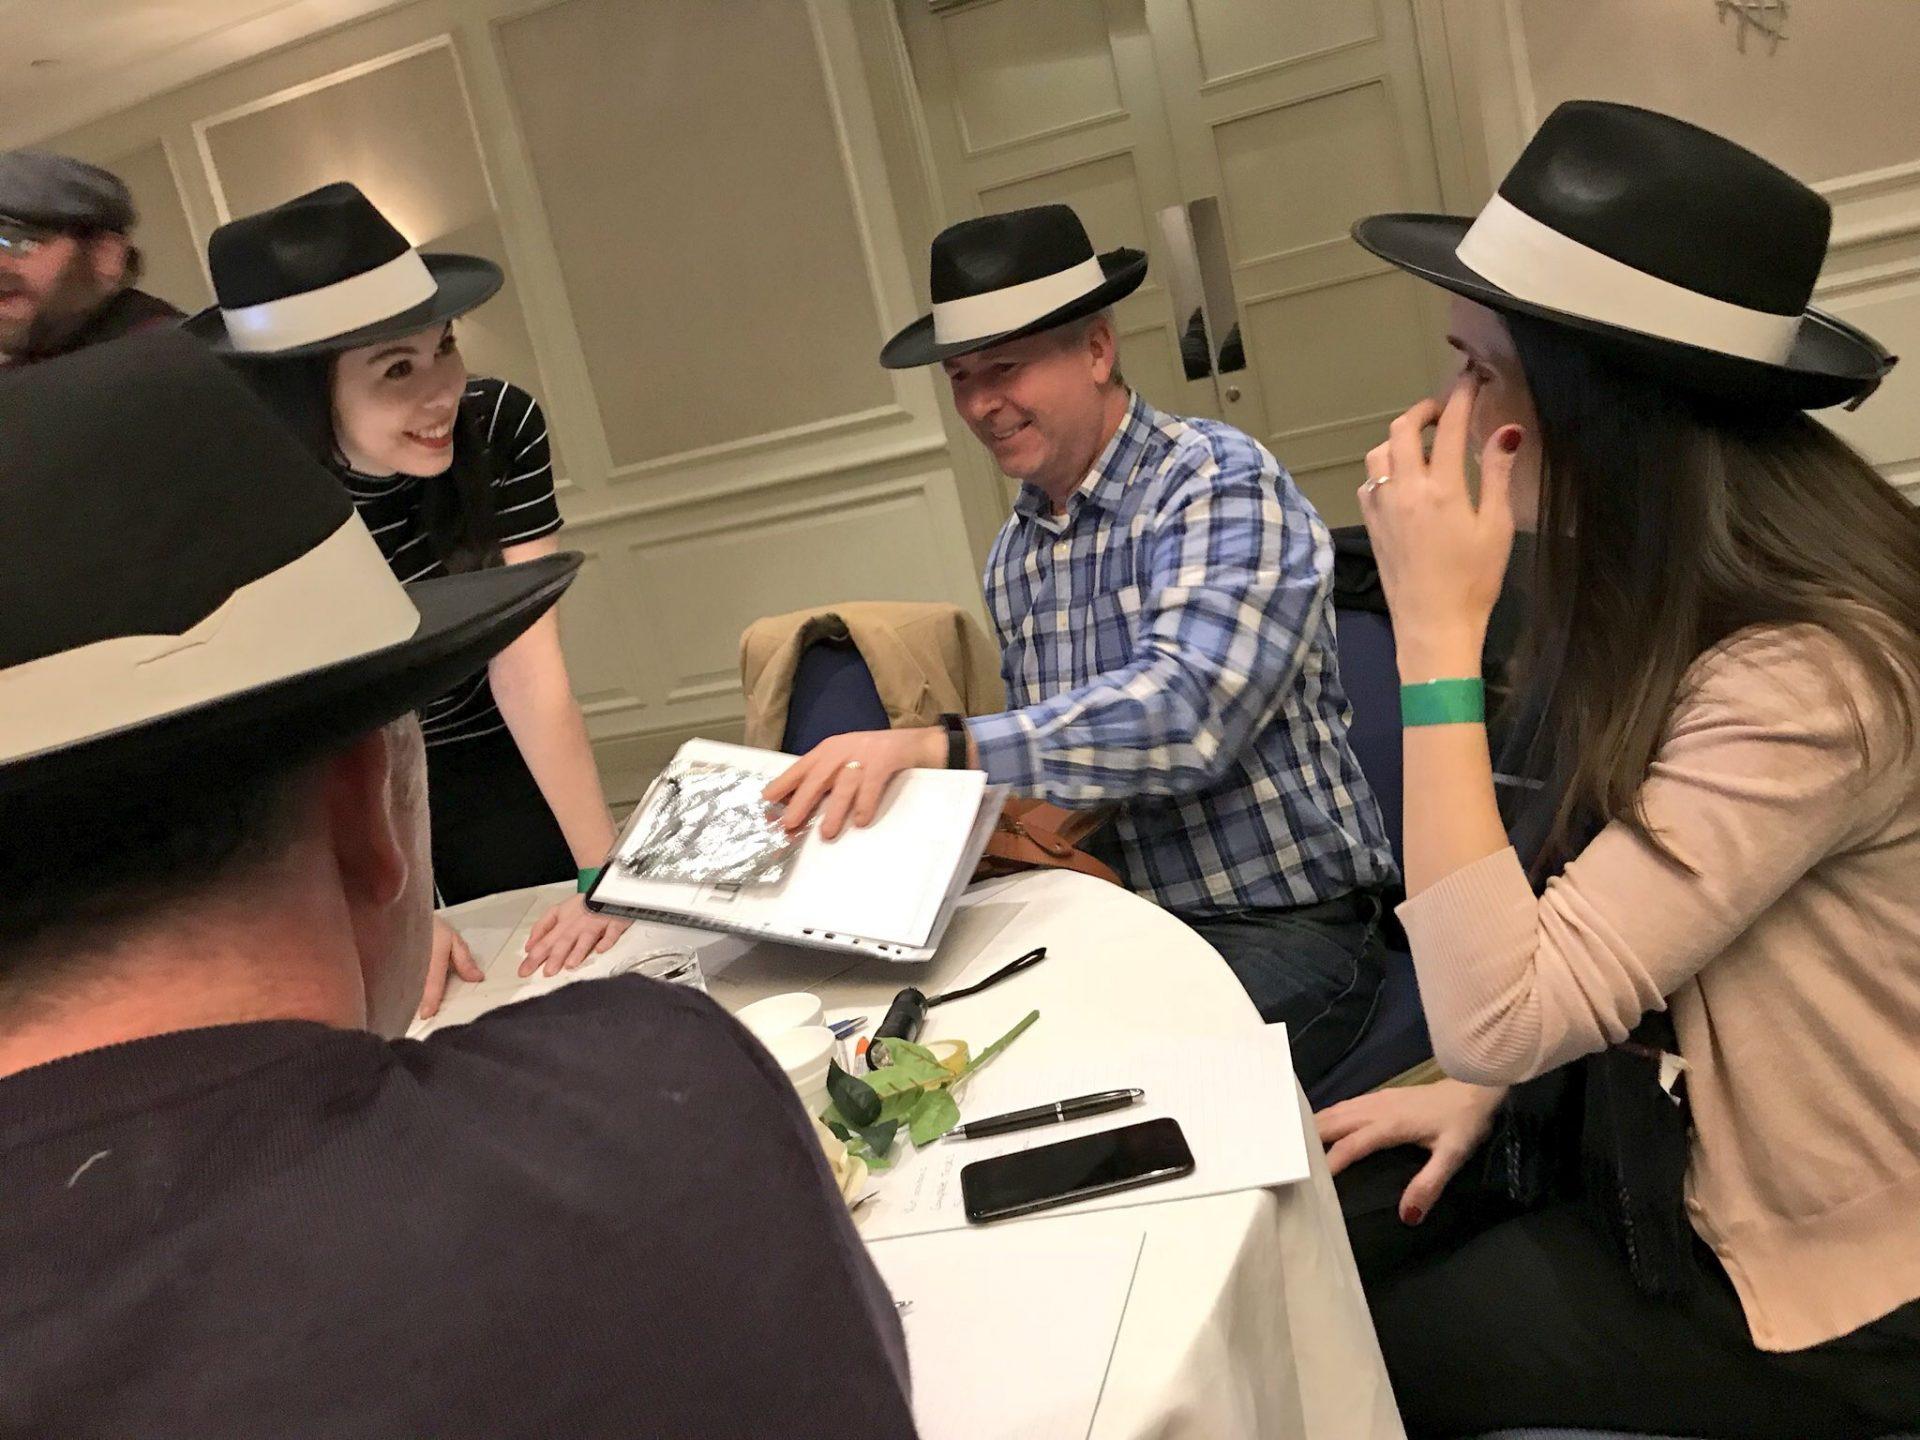 Teams wearing mob hats during their team bonding game with orangeworks.